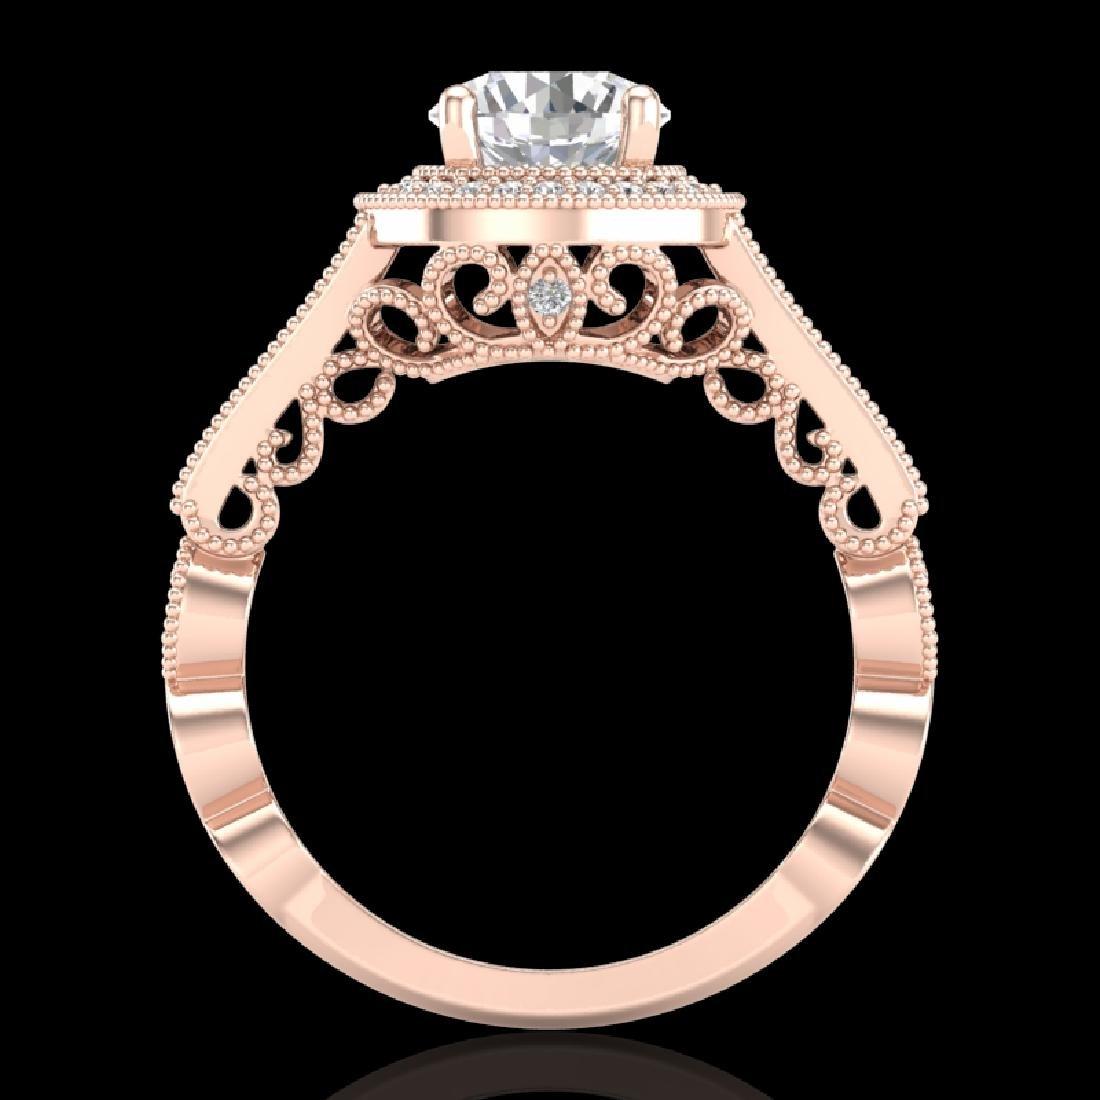 1.91 CTW VS/SI Diamond Solitaire Art Deco Ring 18K Rose